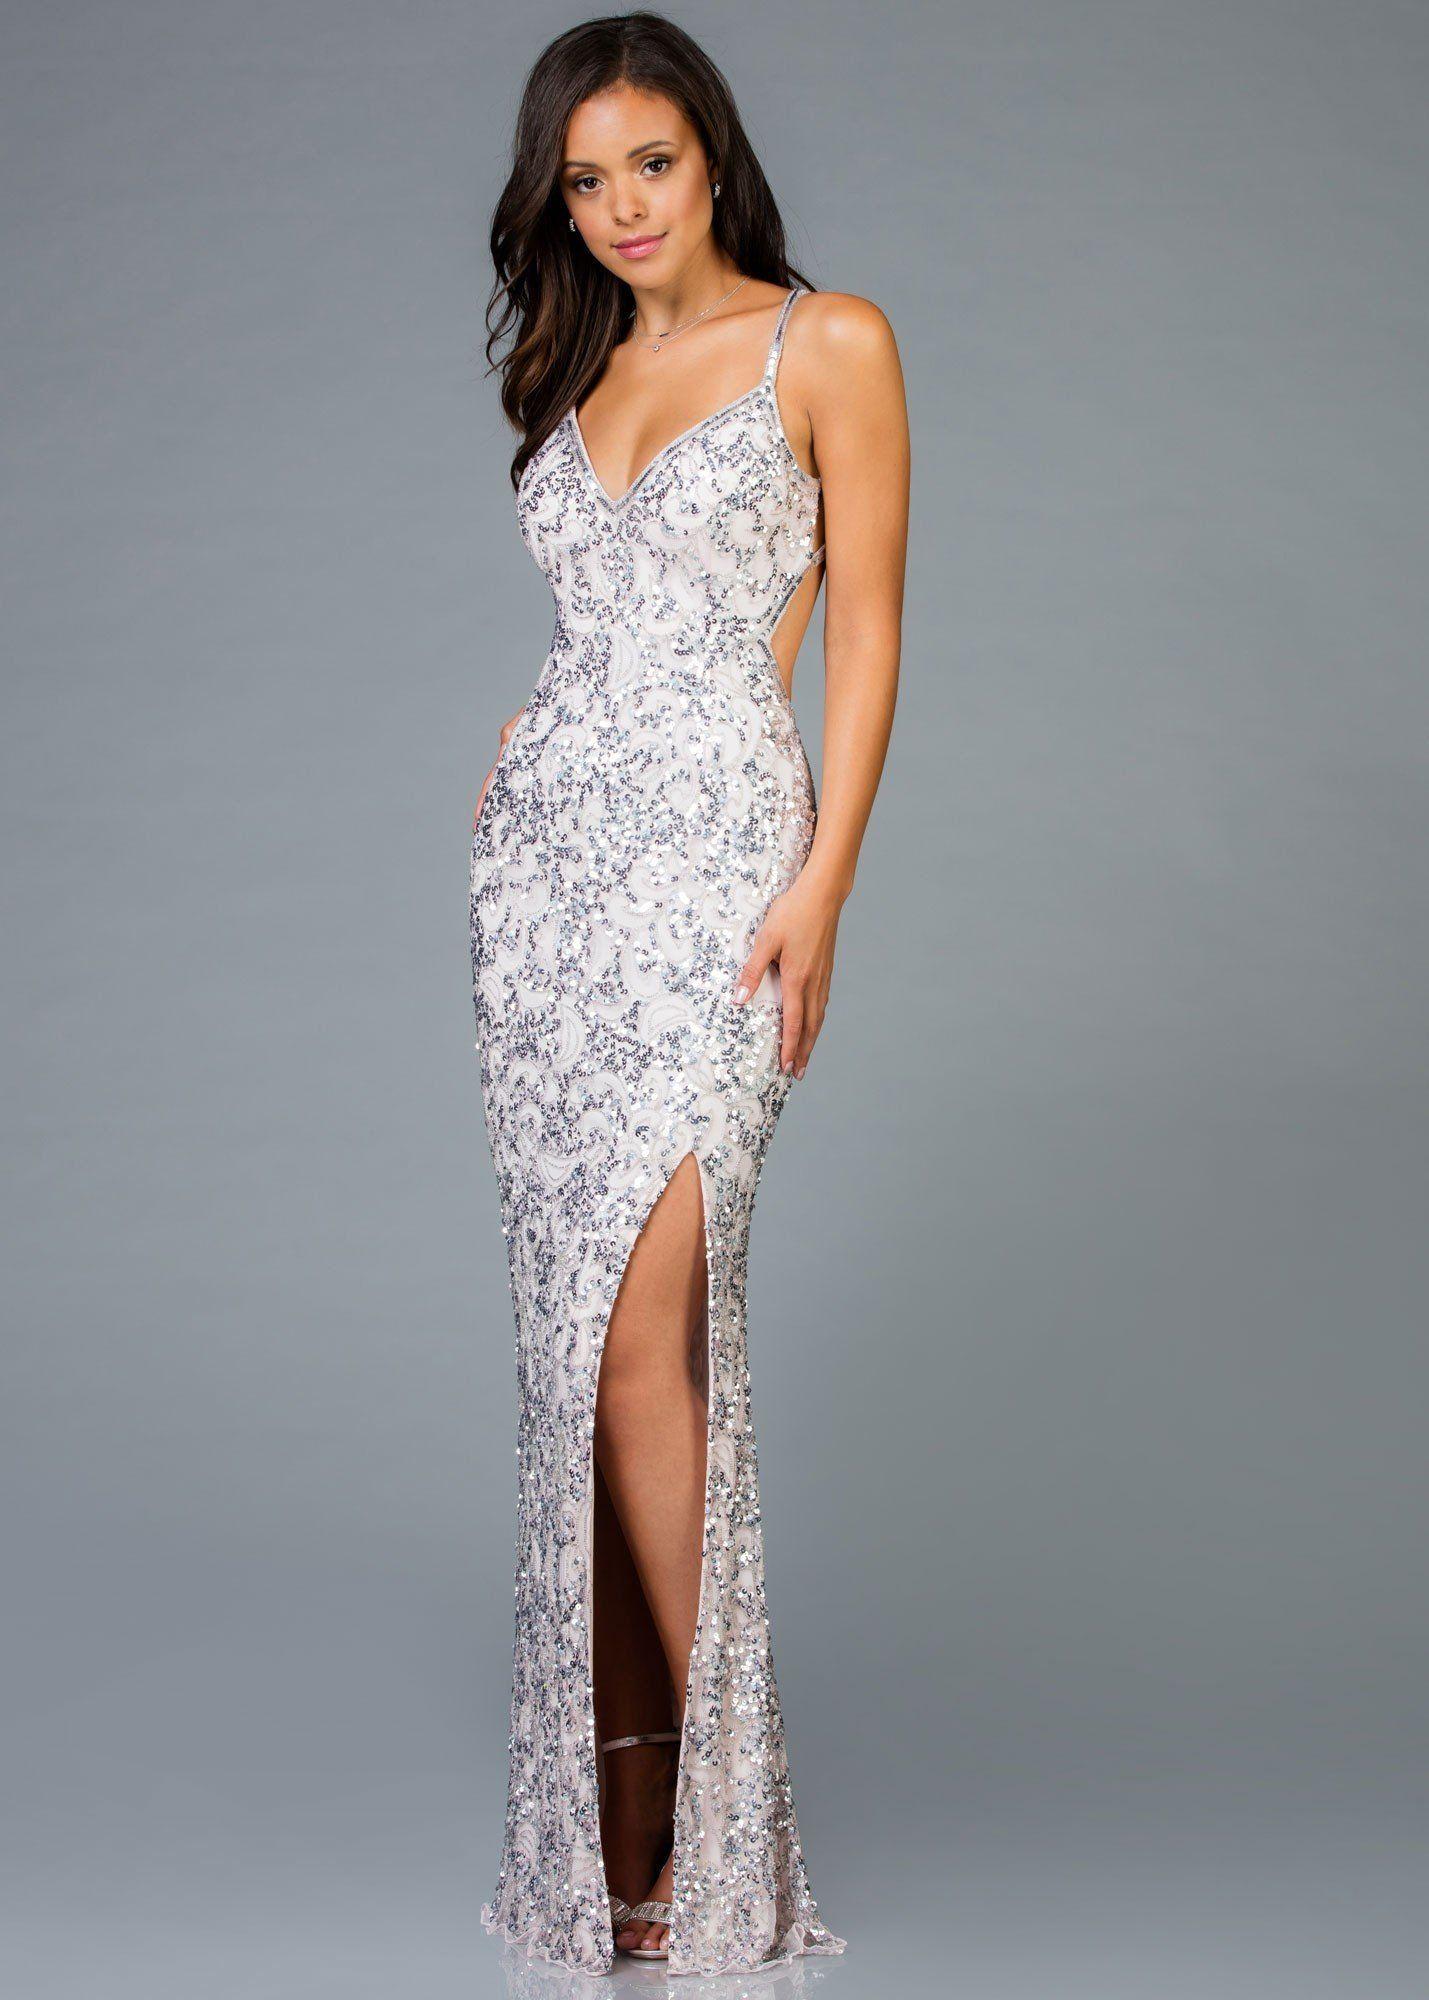 06c826dd6cb Best Prom Dresses 2019 - Gomes Weine AG